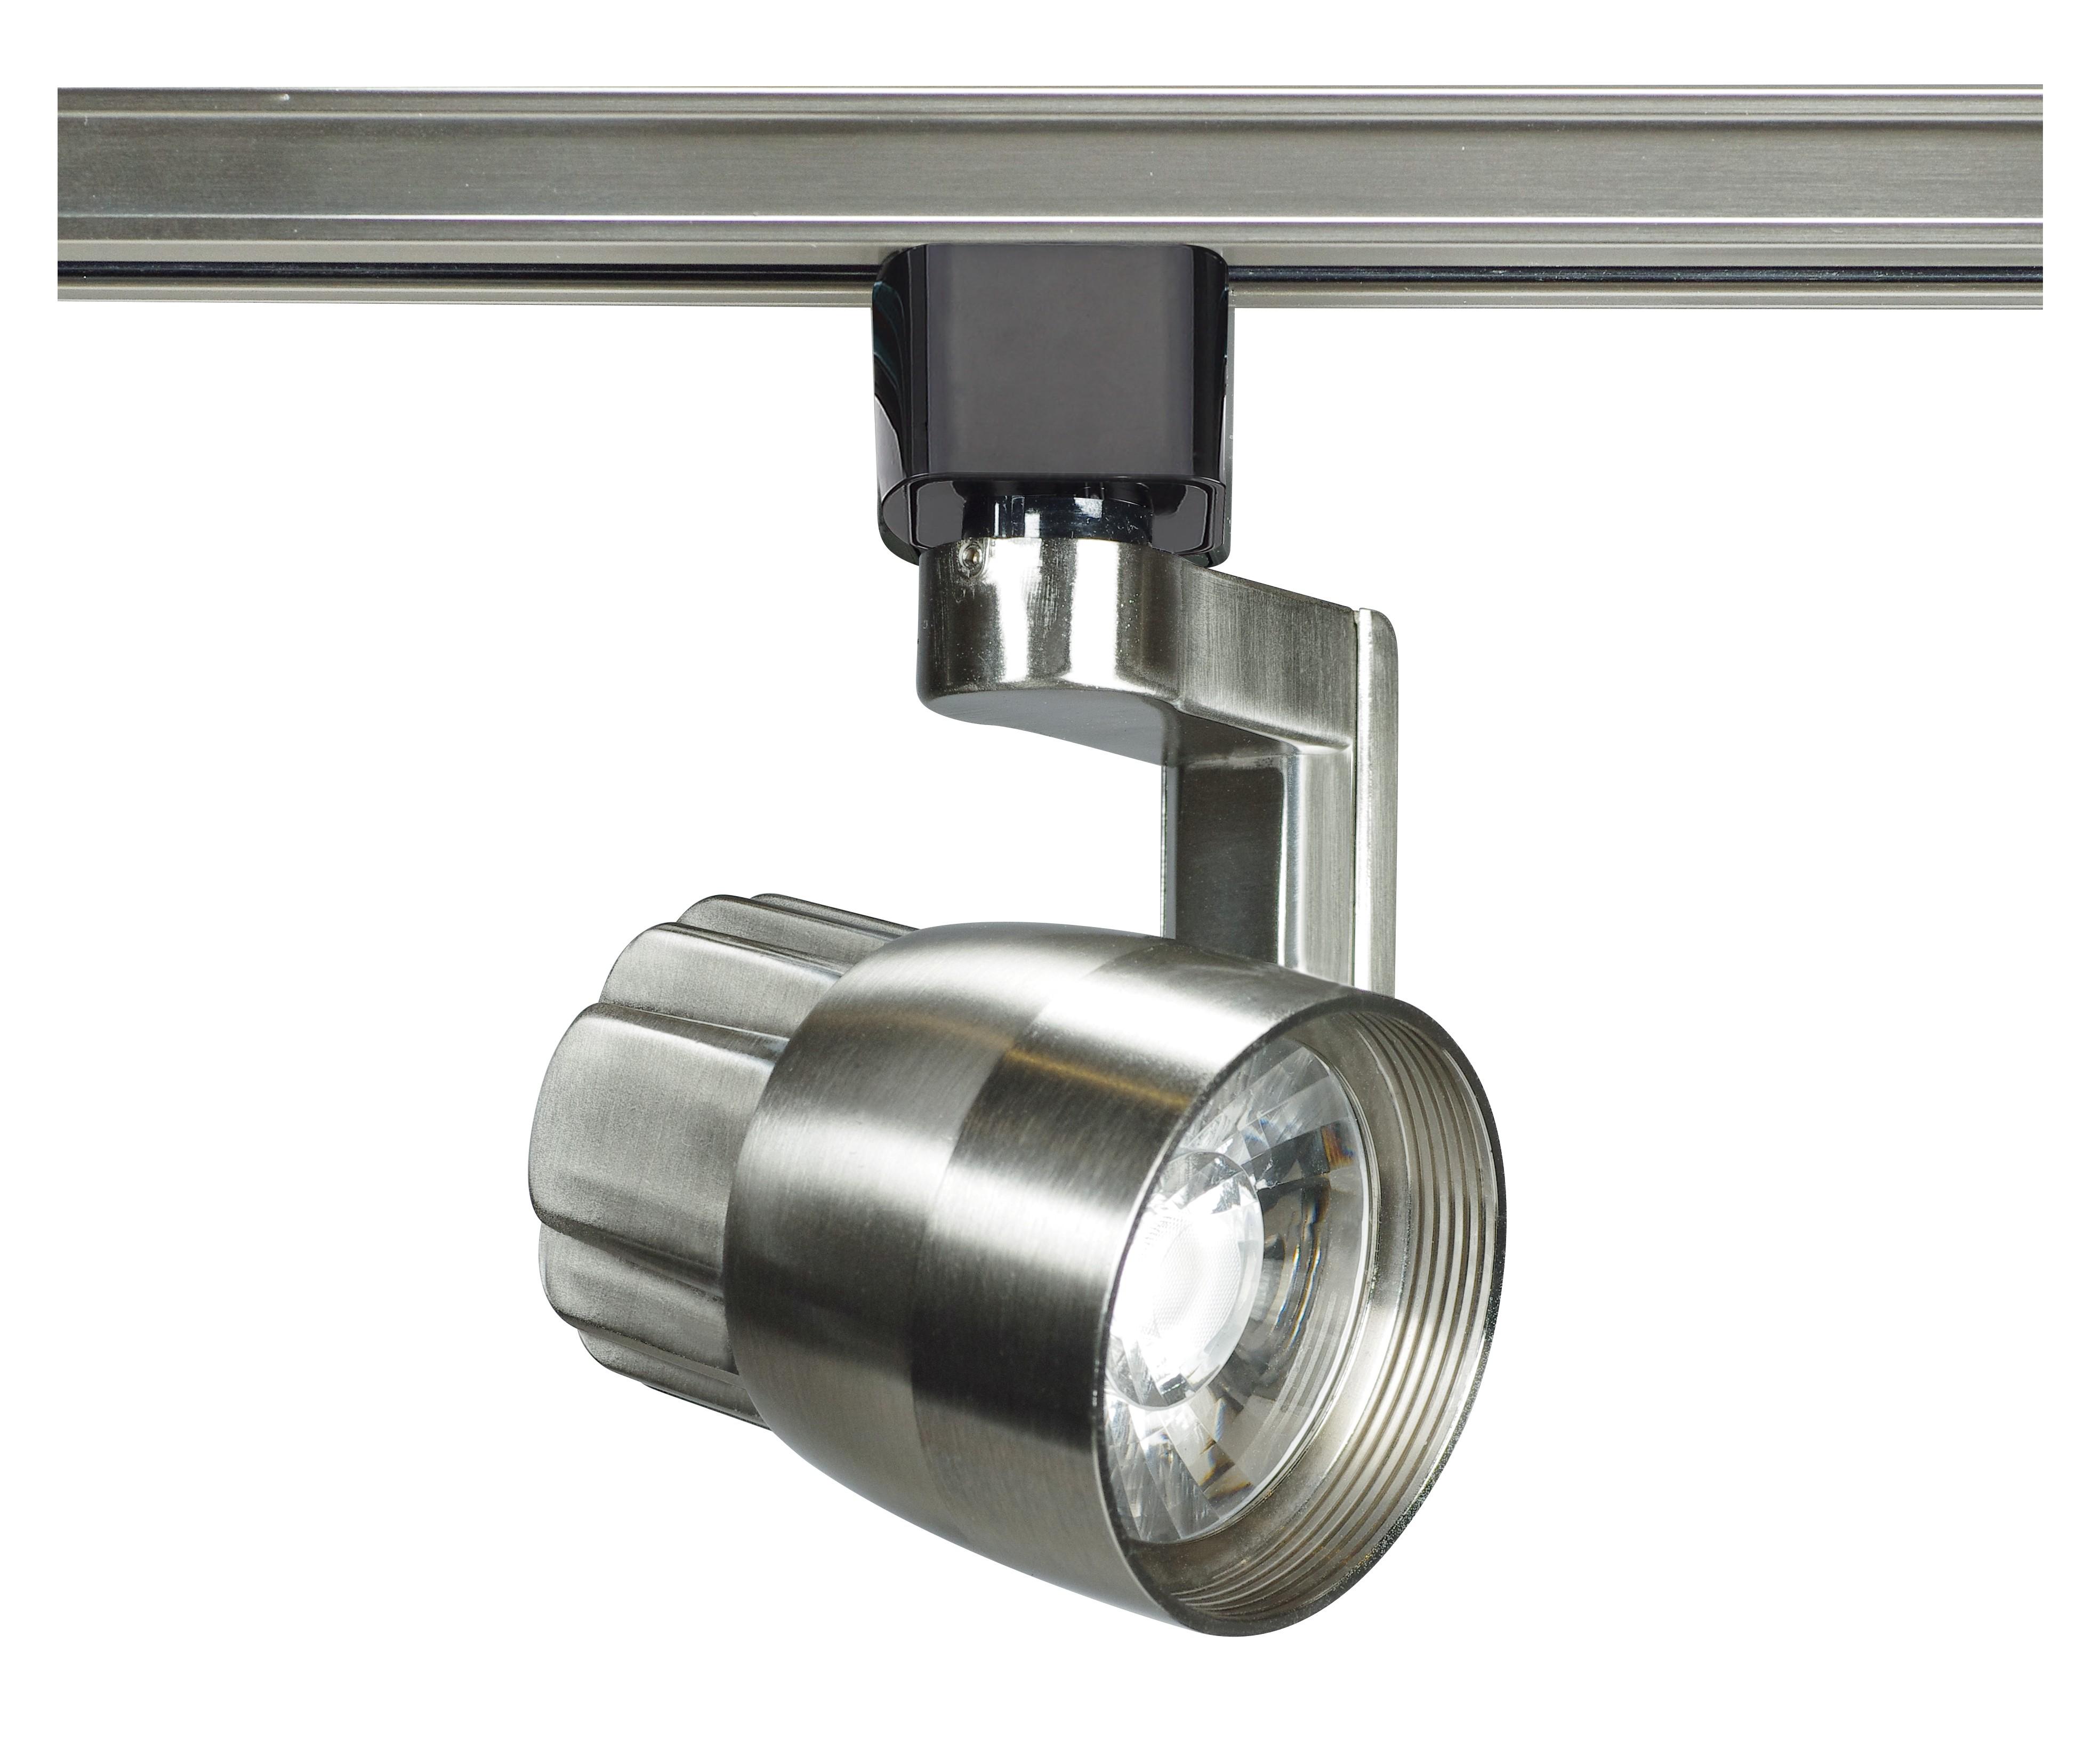 Nuvo Lighting Th425 1 Light Led 12w Track Head Angle Arm